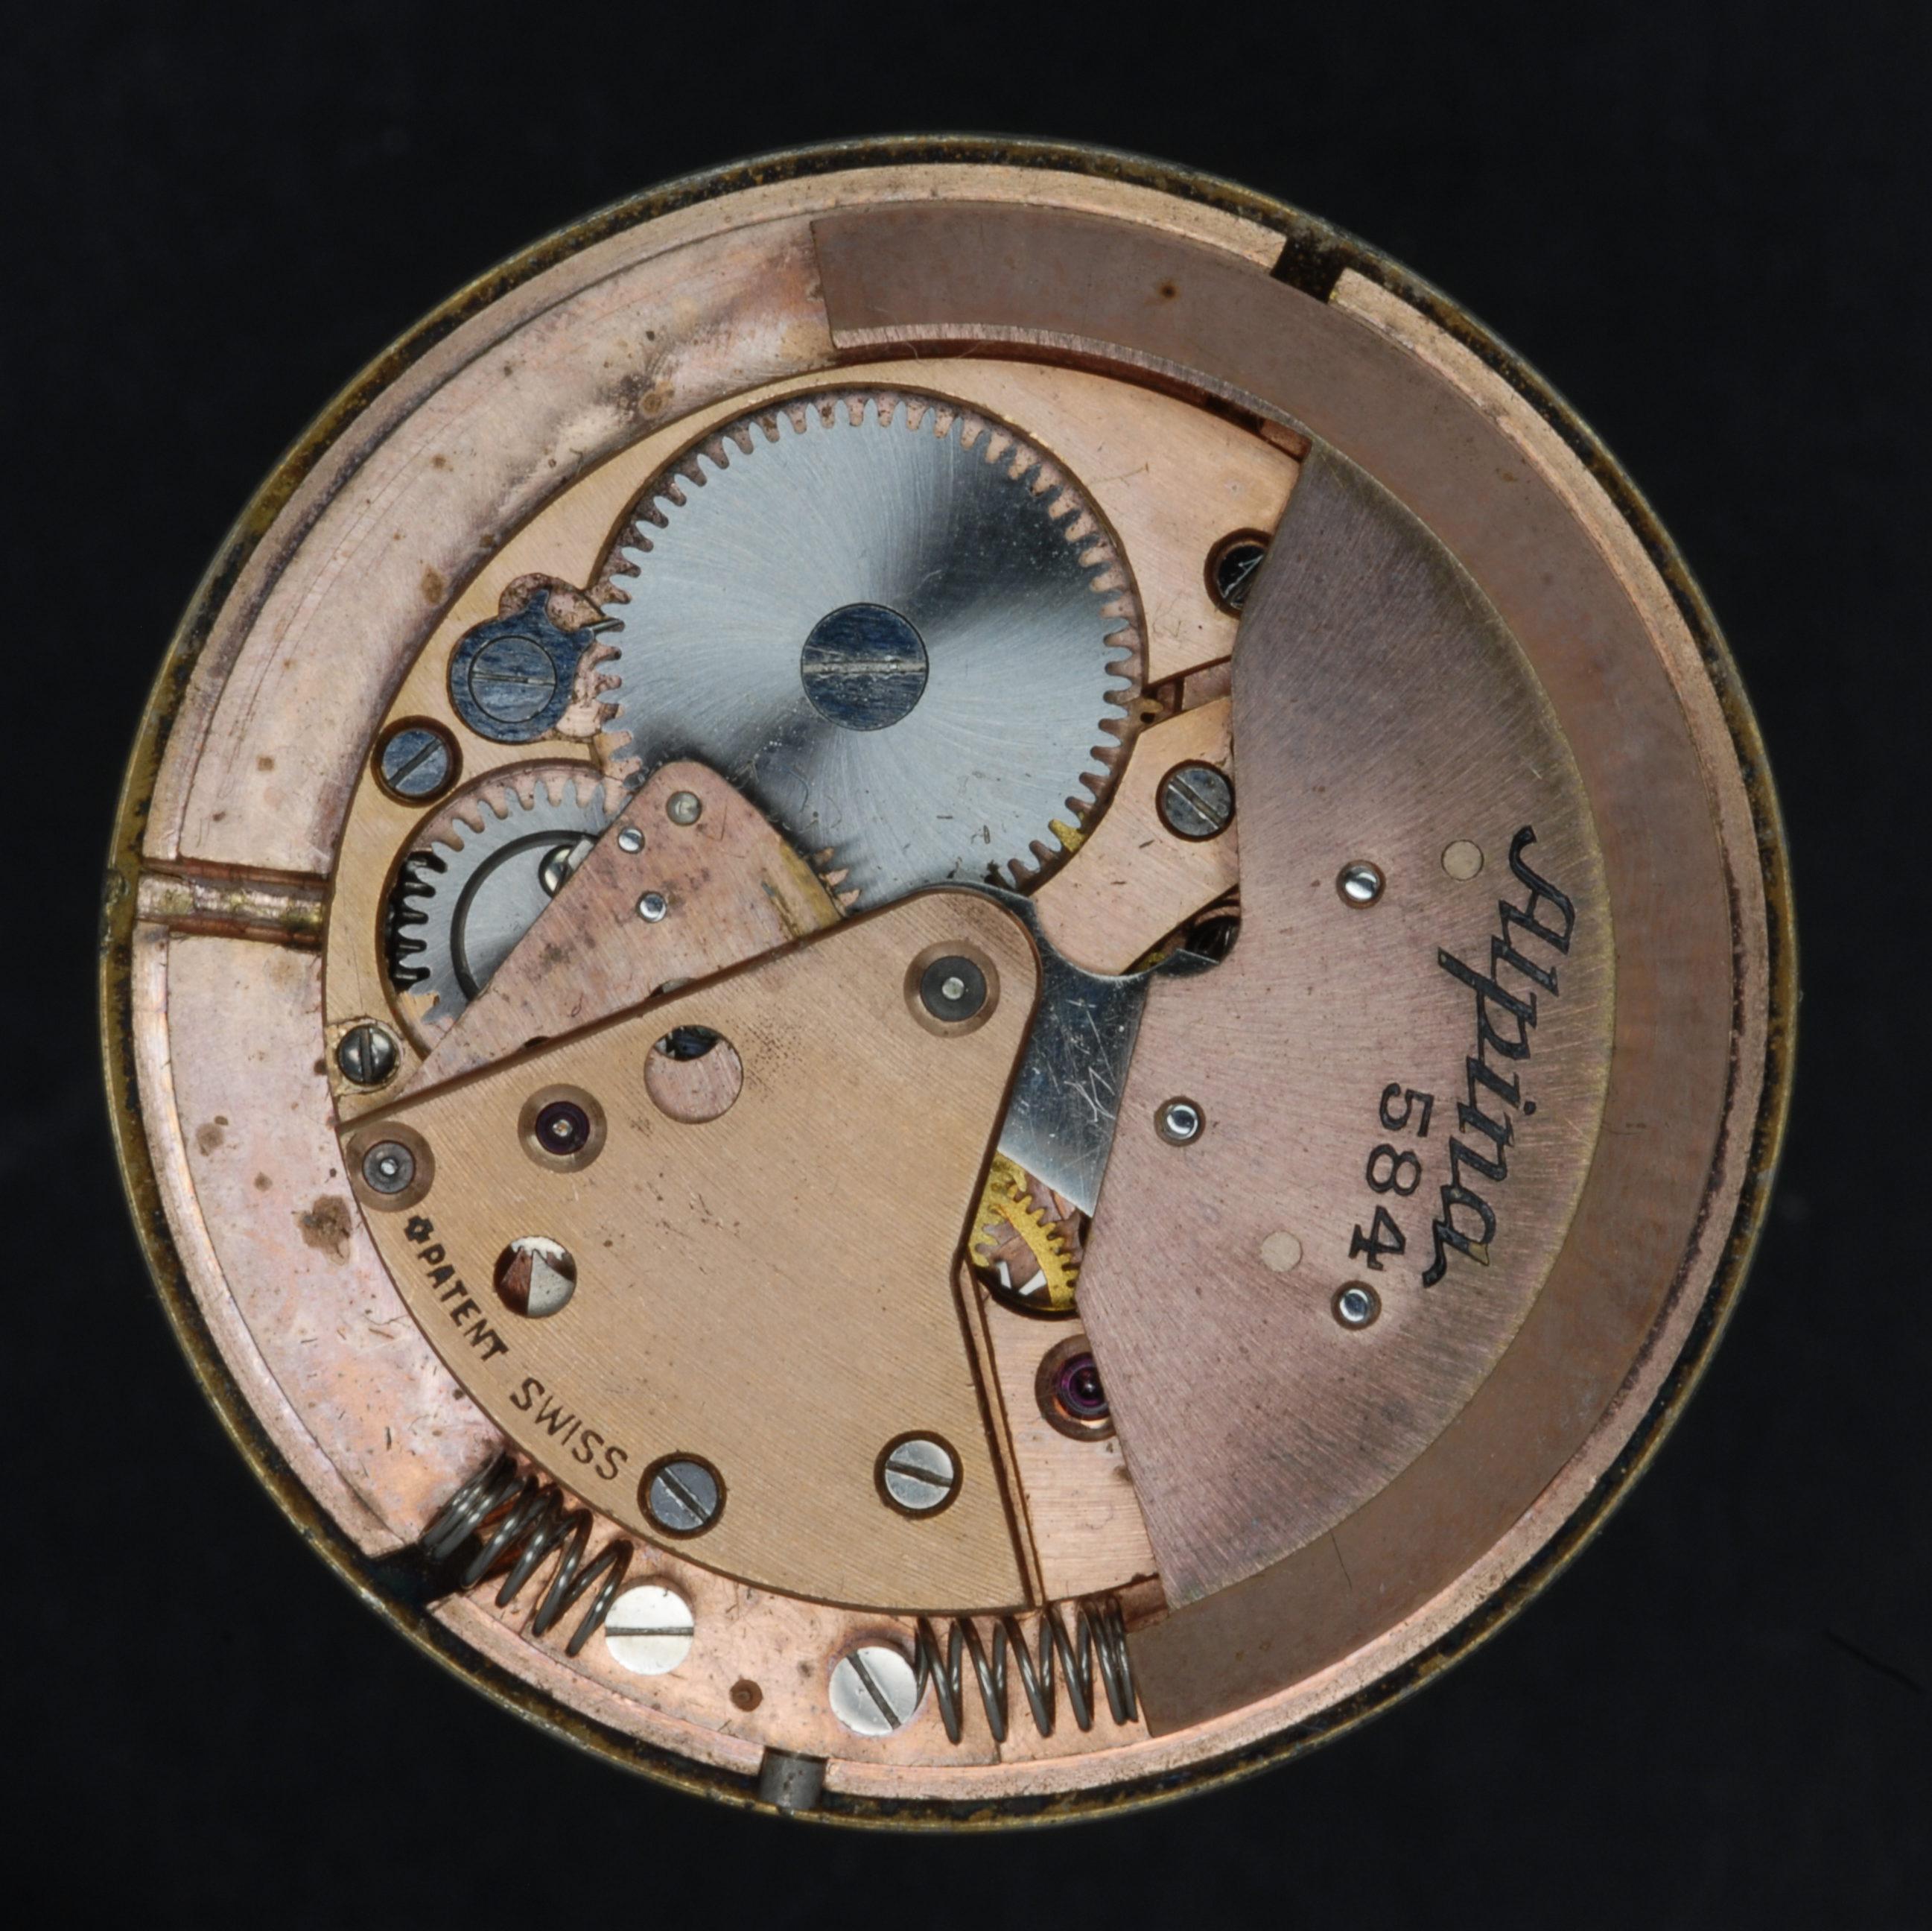 Alina 584 Hammerautomatik